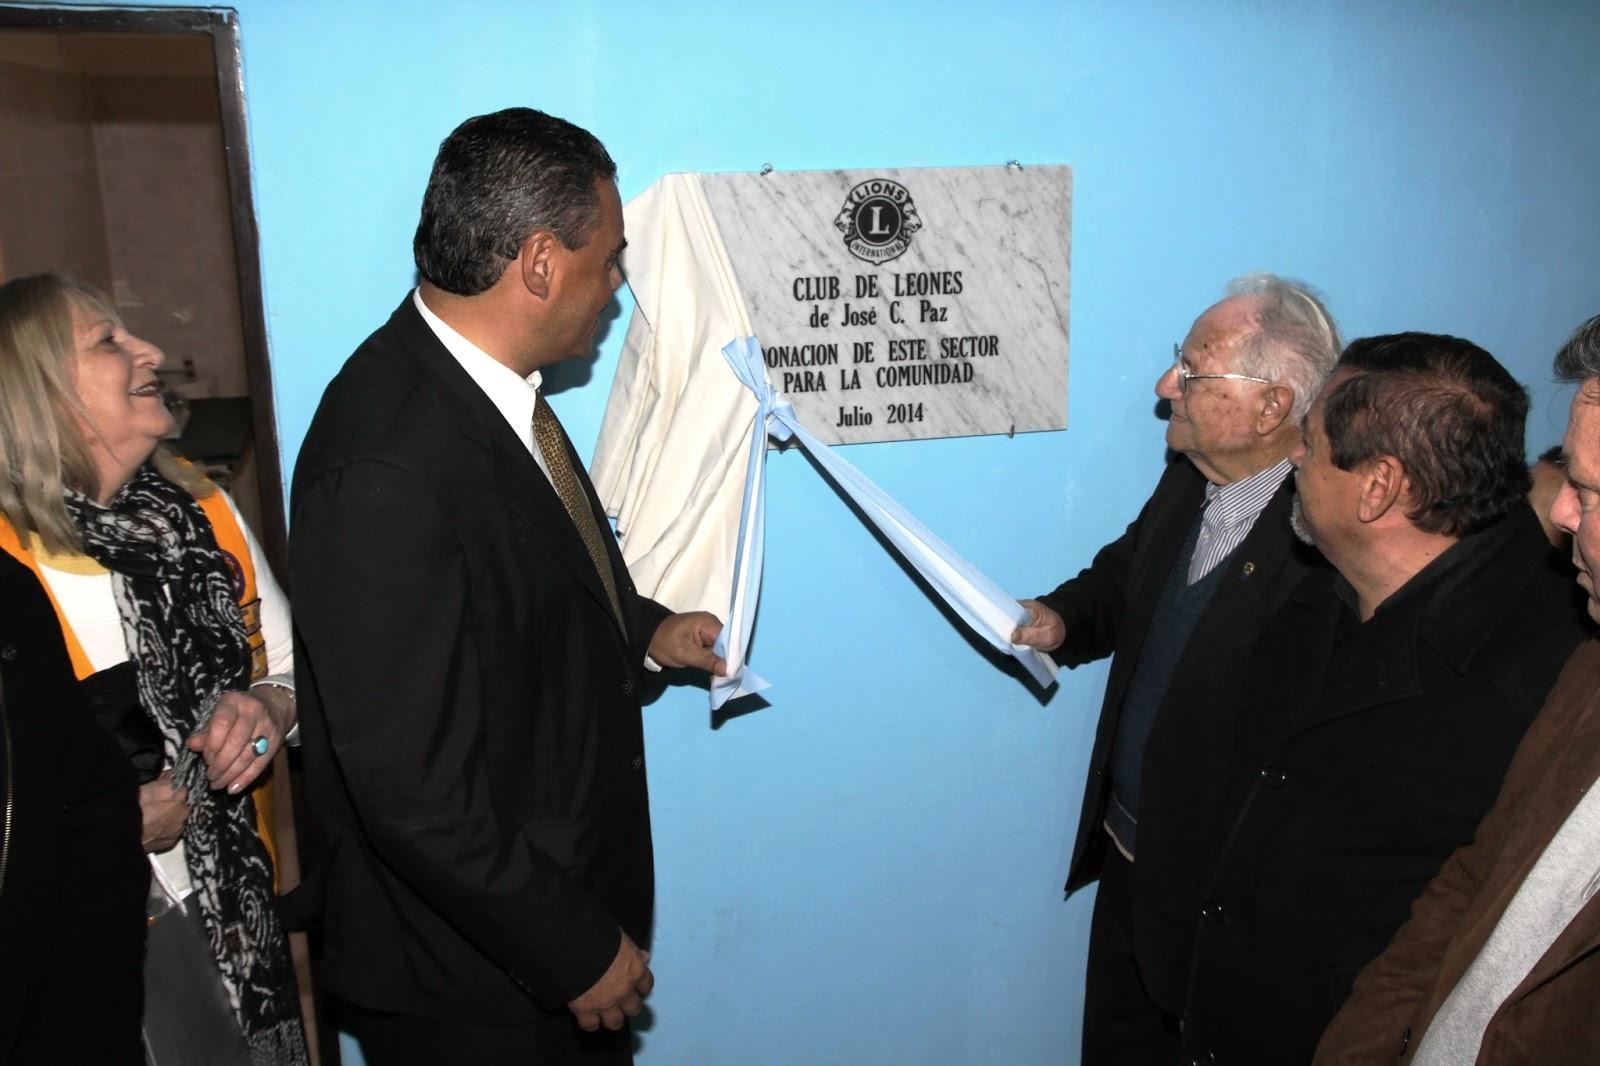 Prensa Municipalidad Jos C Paz Inauguraci N Del Centro